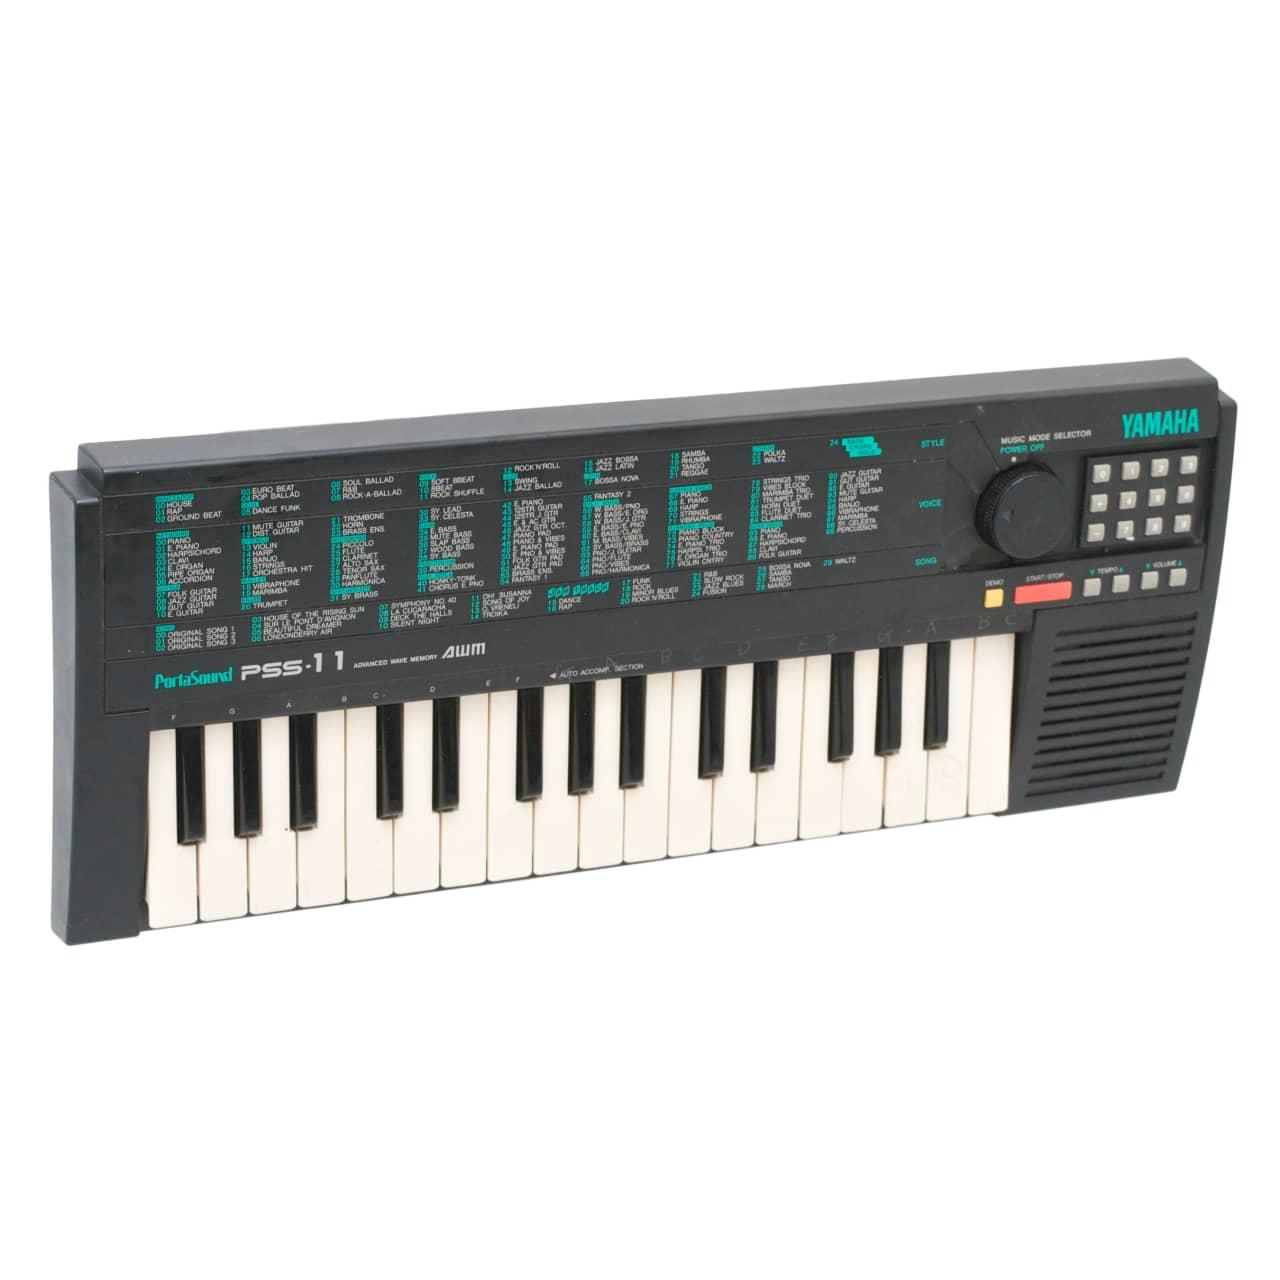 Image Result For Yamaha Keyboard Demos